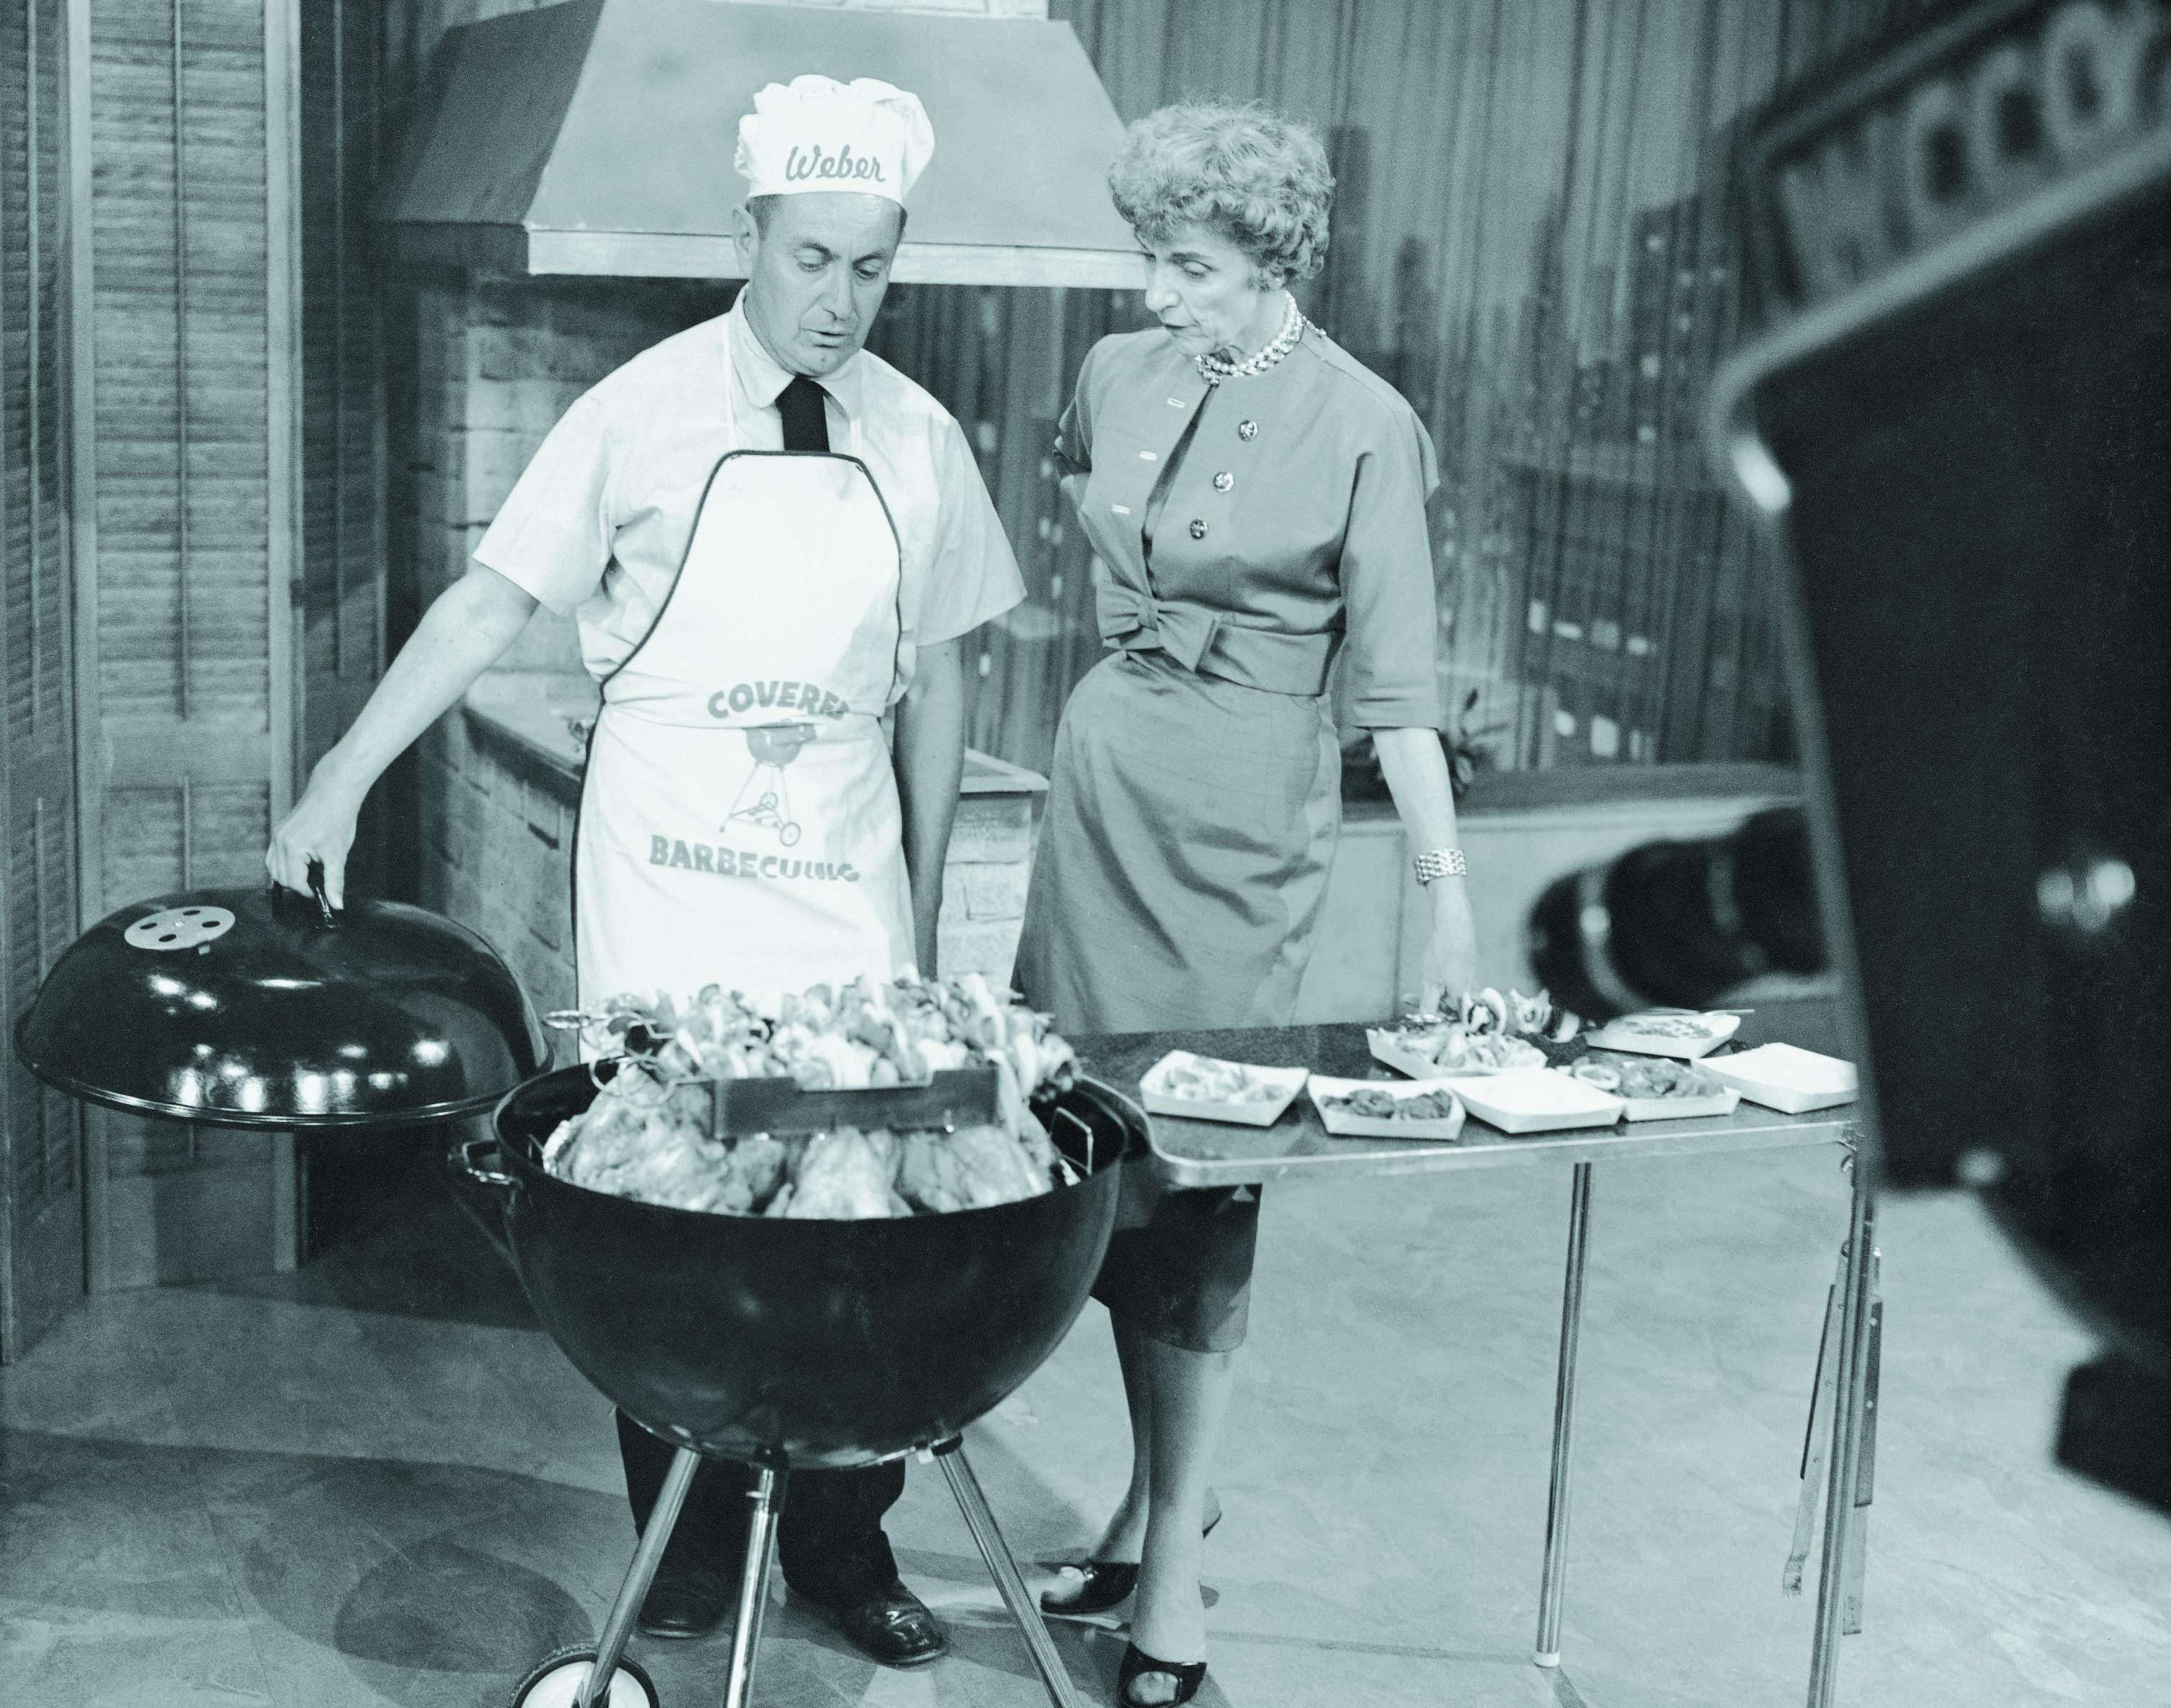 barbecue weber noir et blanc